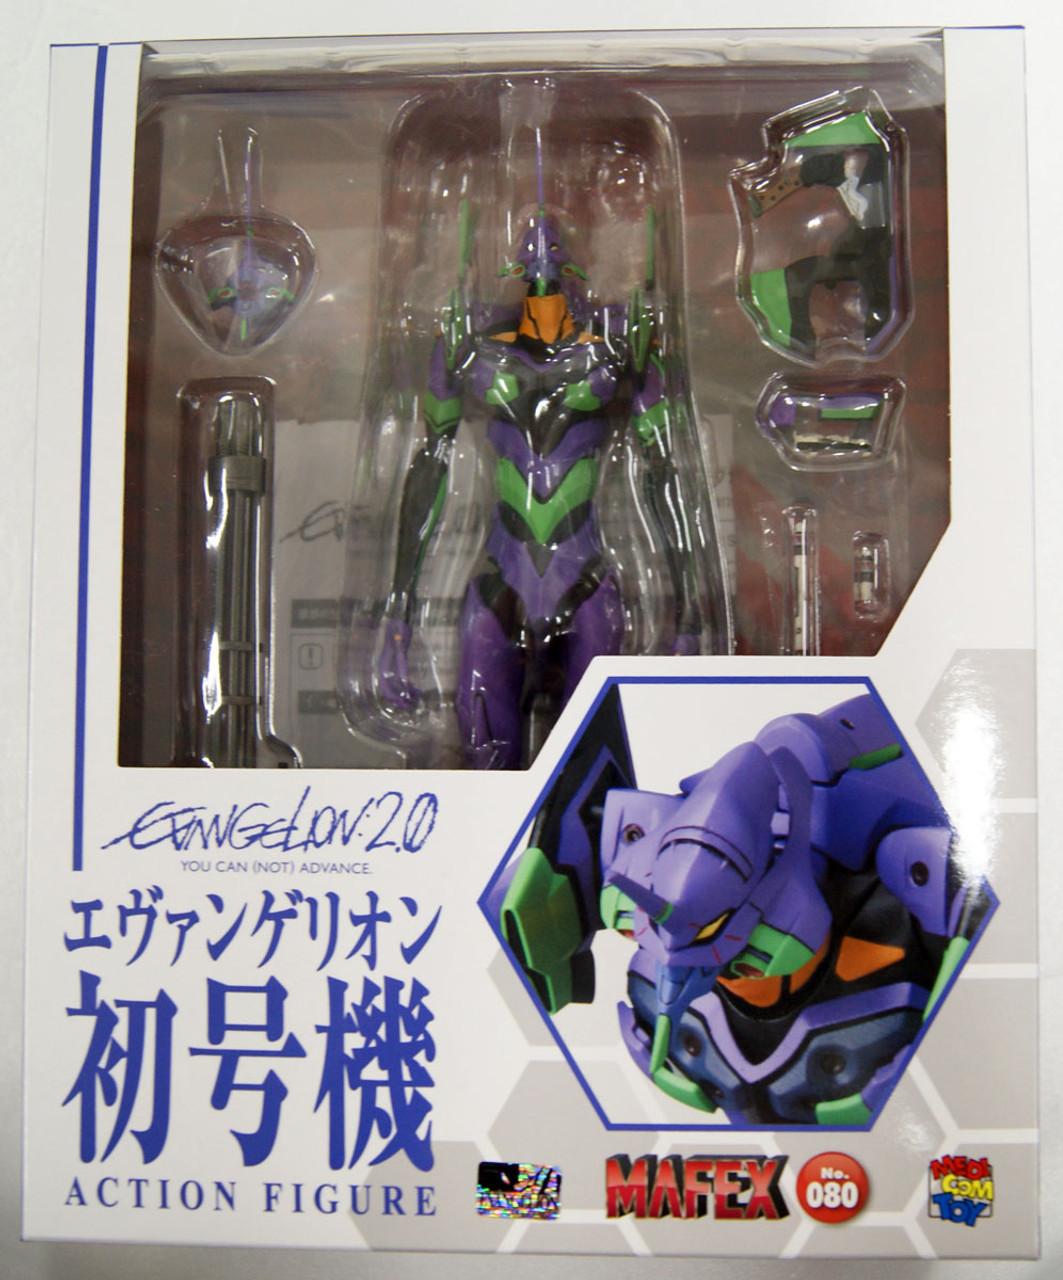 MAFEX No.080 Evangelion 2.0 EVA-01 Action Figures New in Box